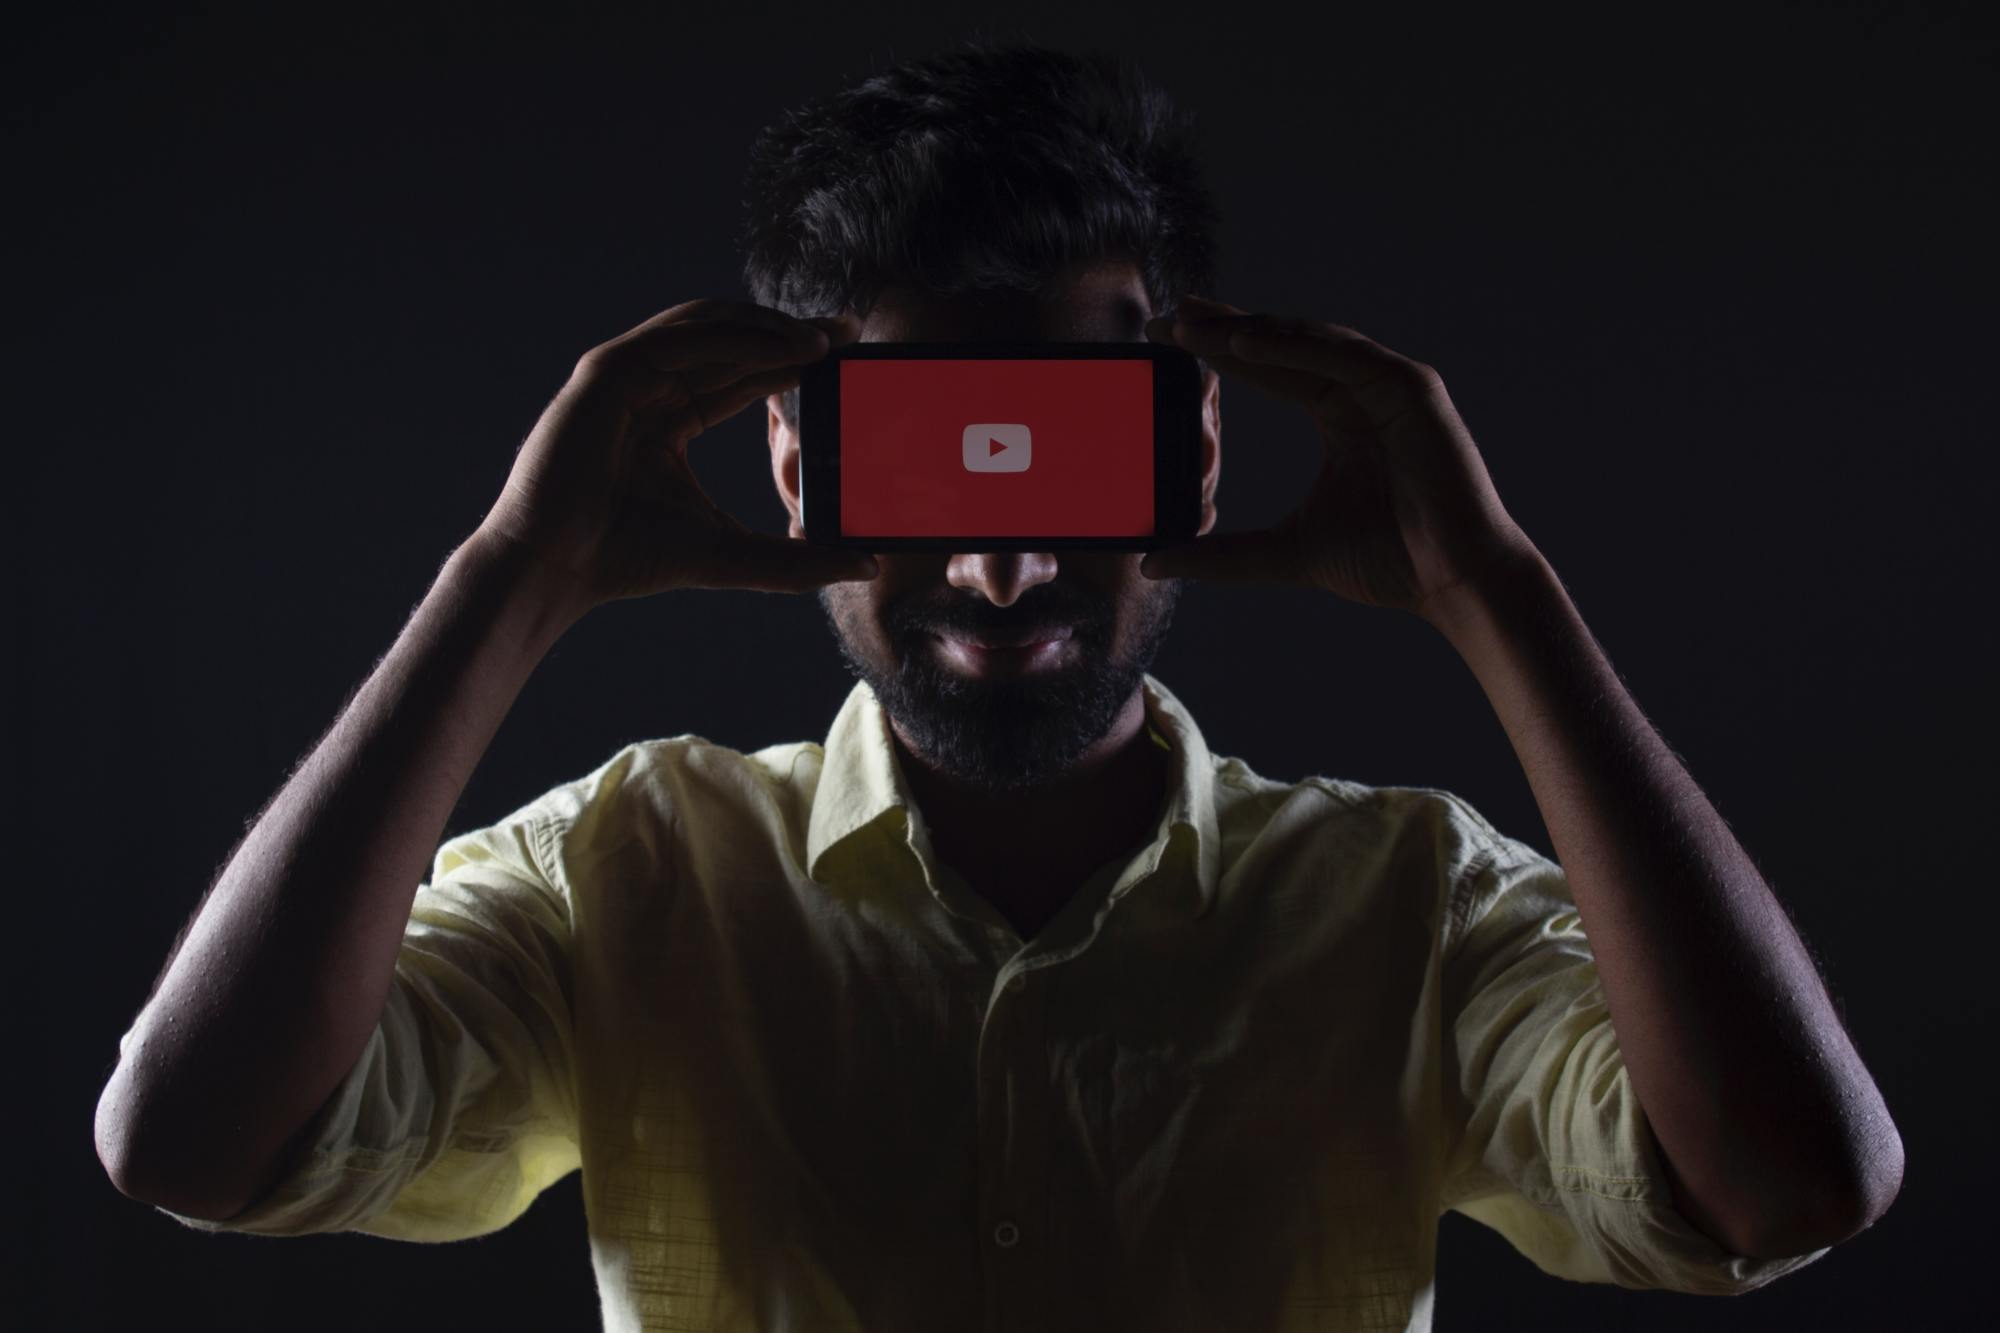 Man holds a camera phone